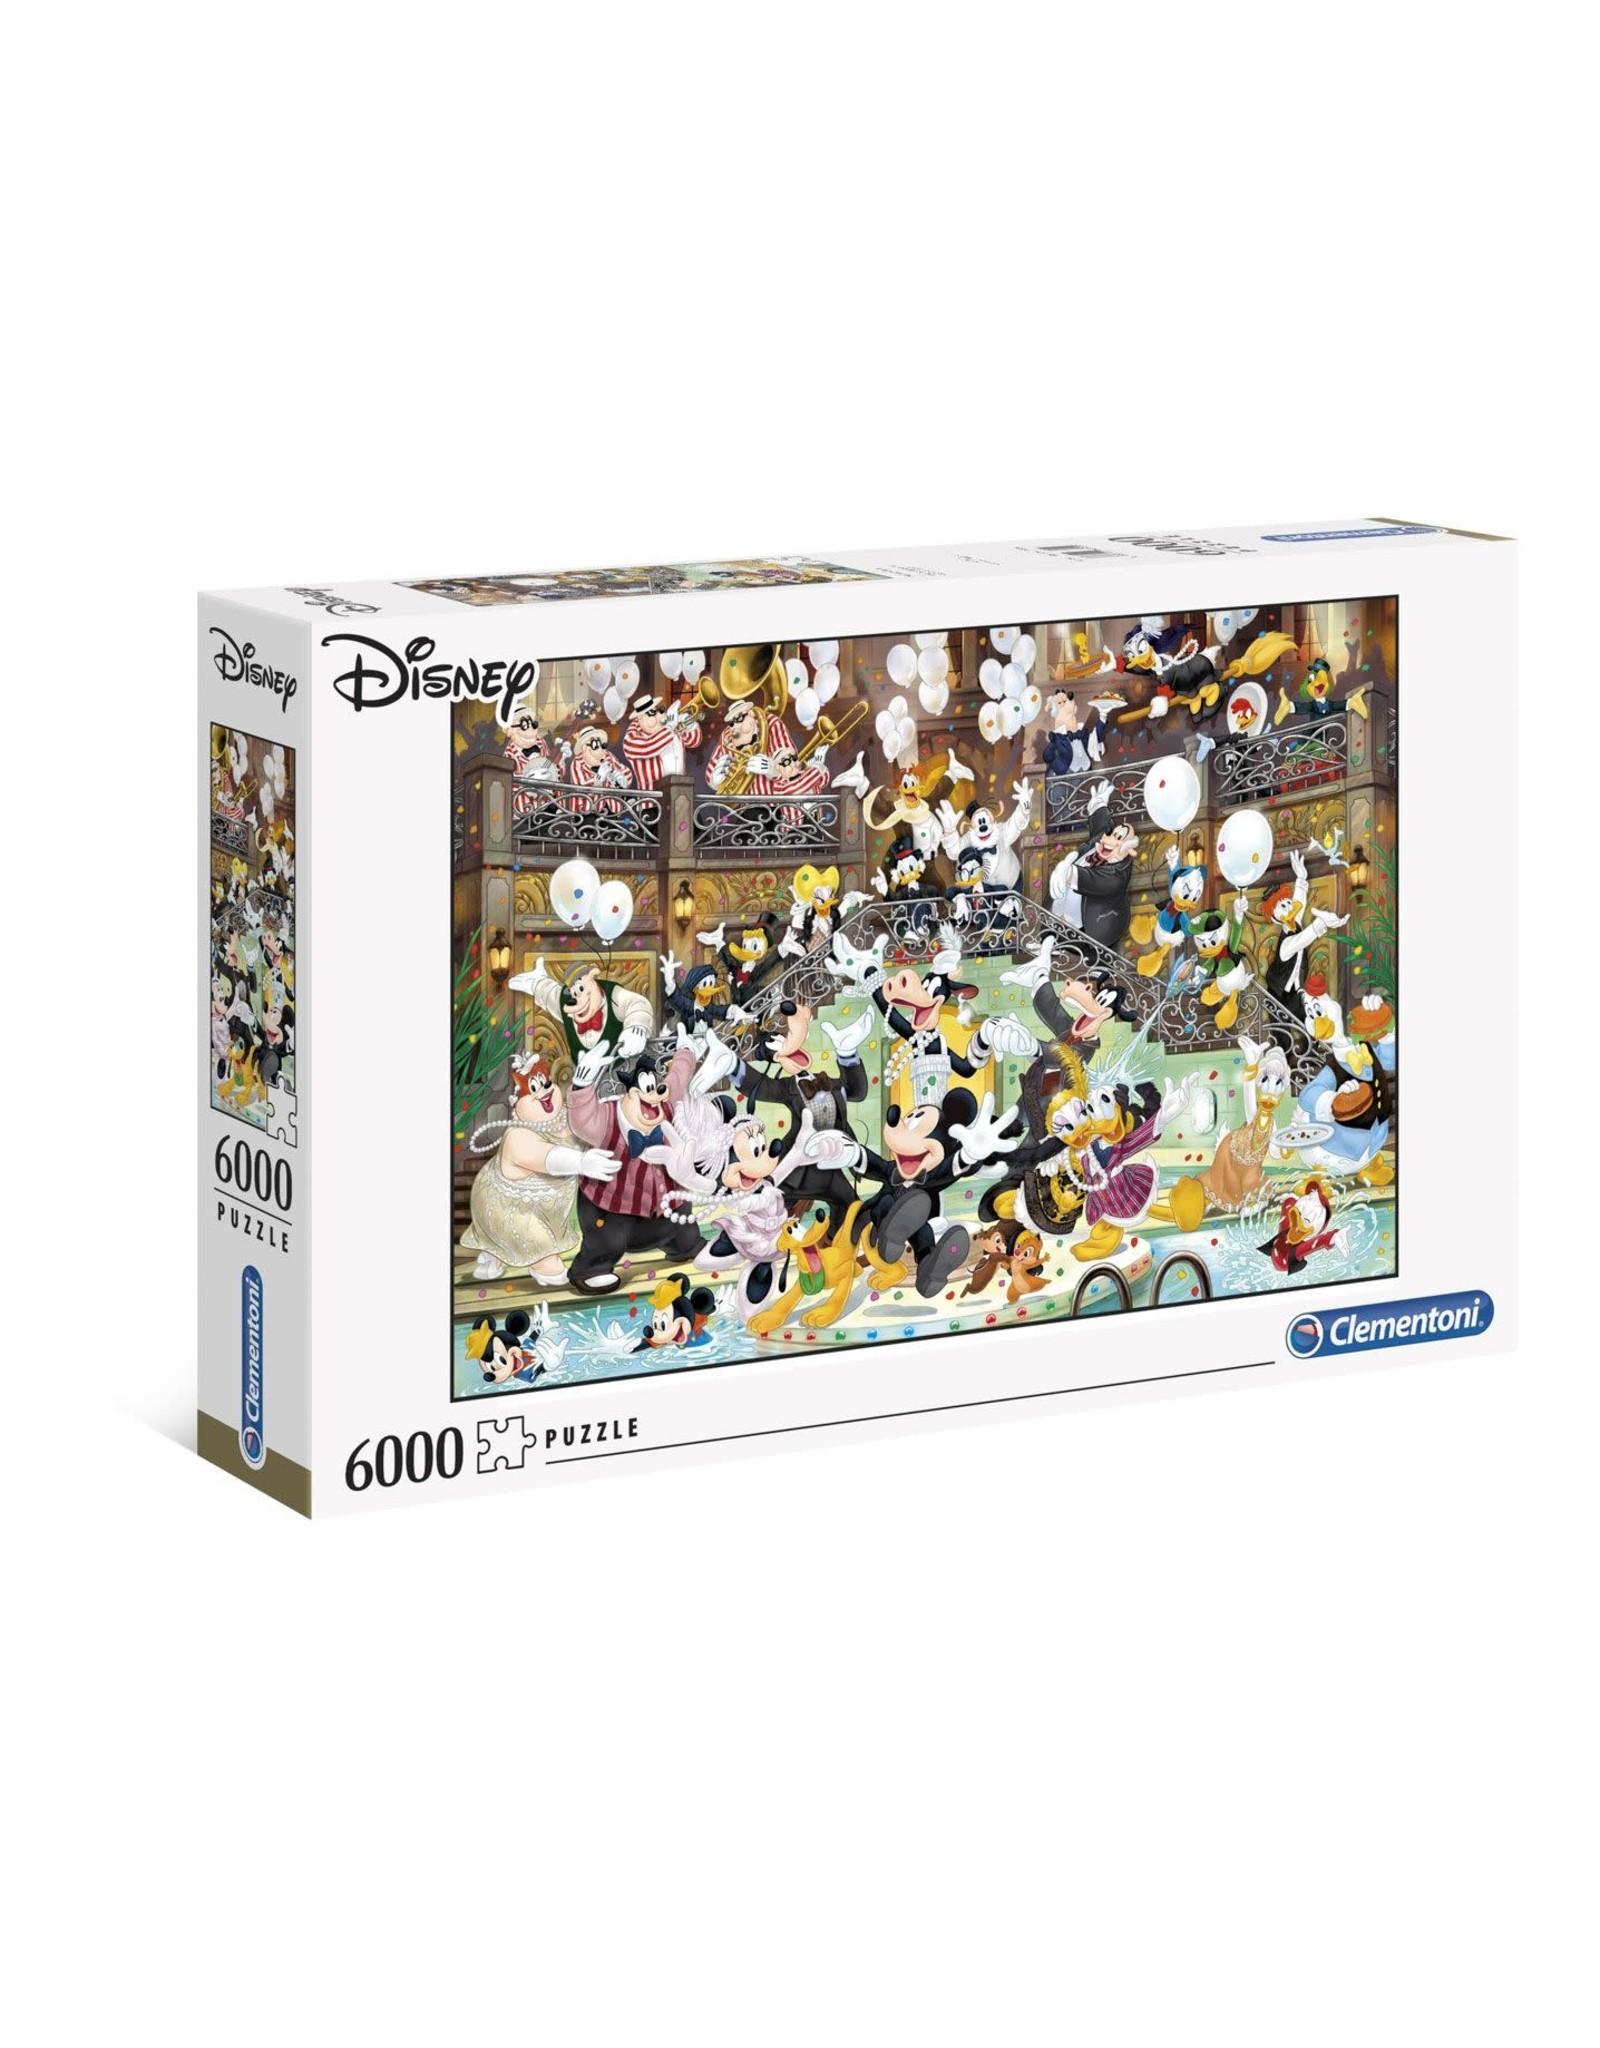 Clementoni DISNEY Masterpiece  Puzzle 6000P - Character Gala